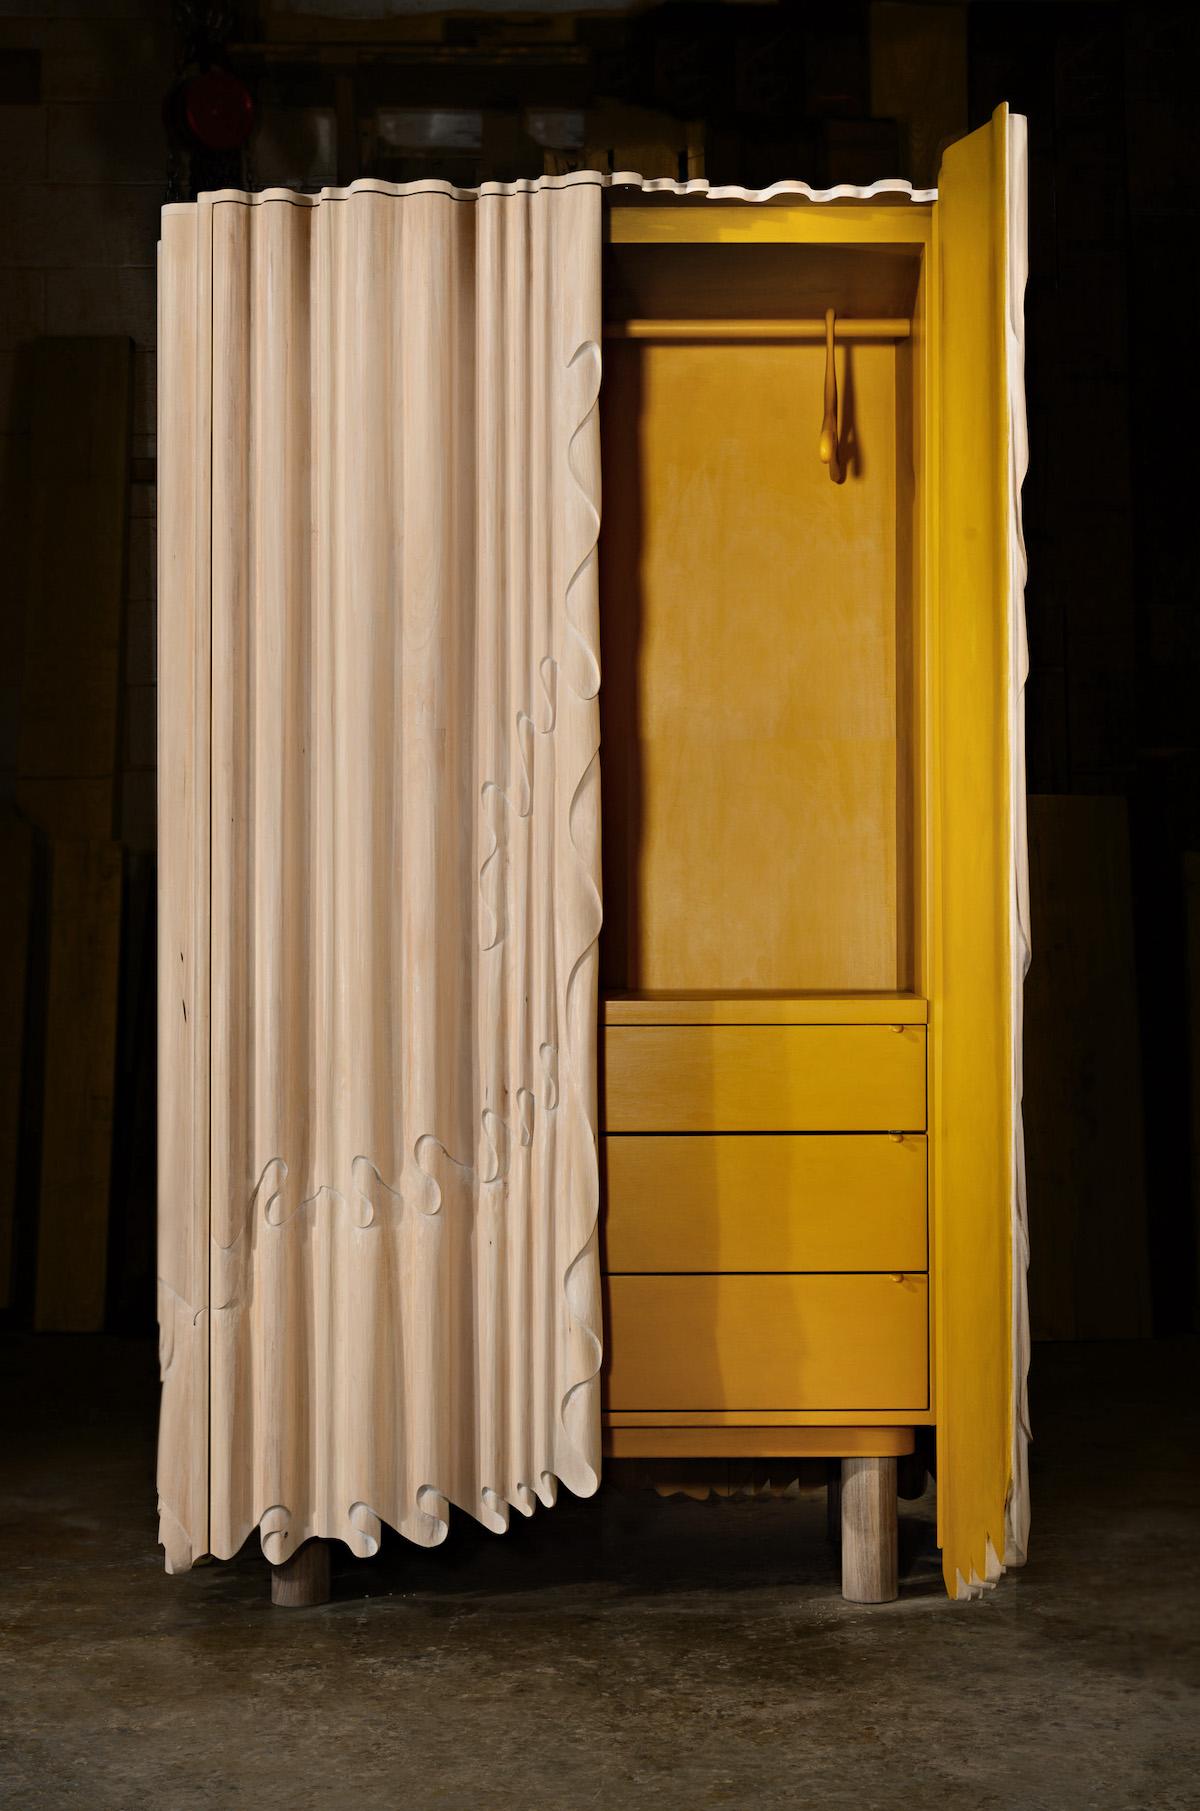 Linenfold Armoire (Perpendicular Style) by artist Christopher Kurtz